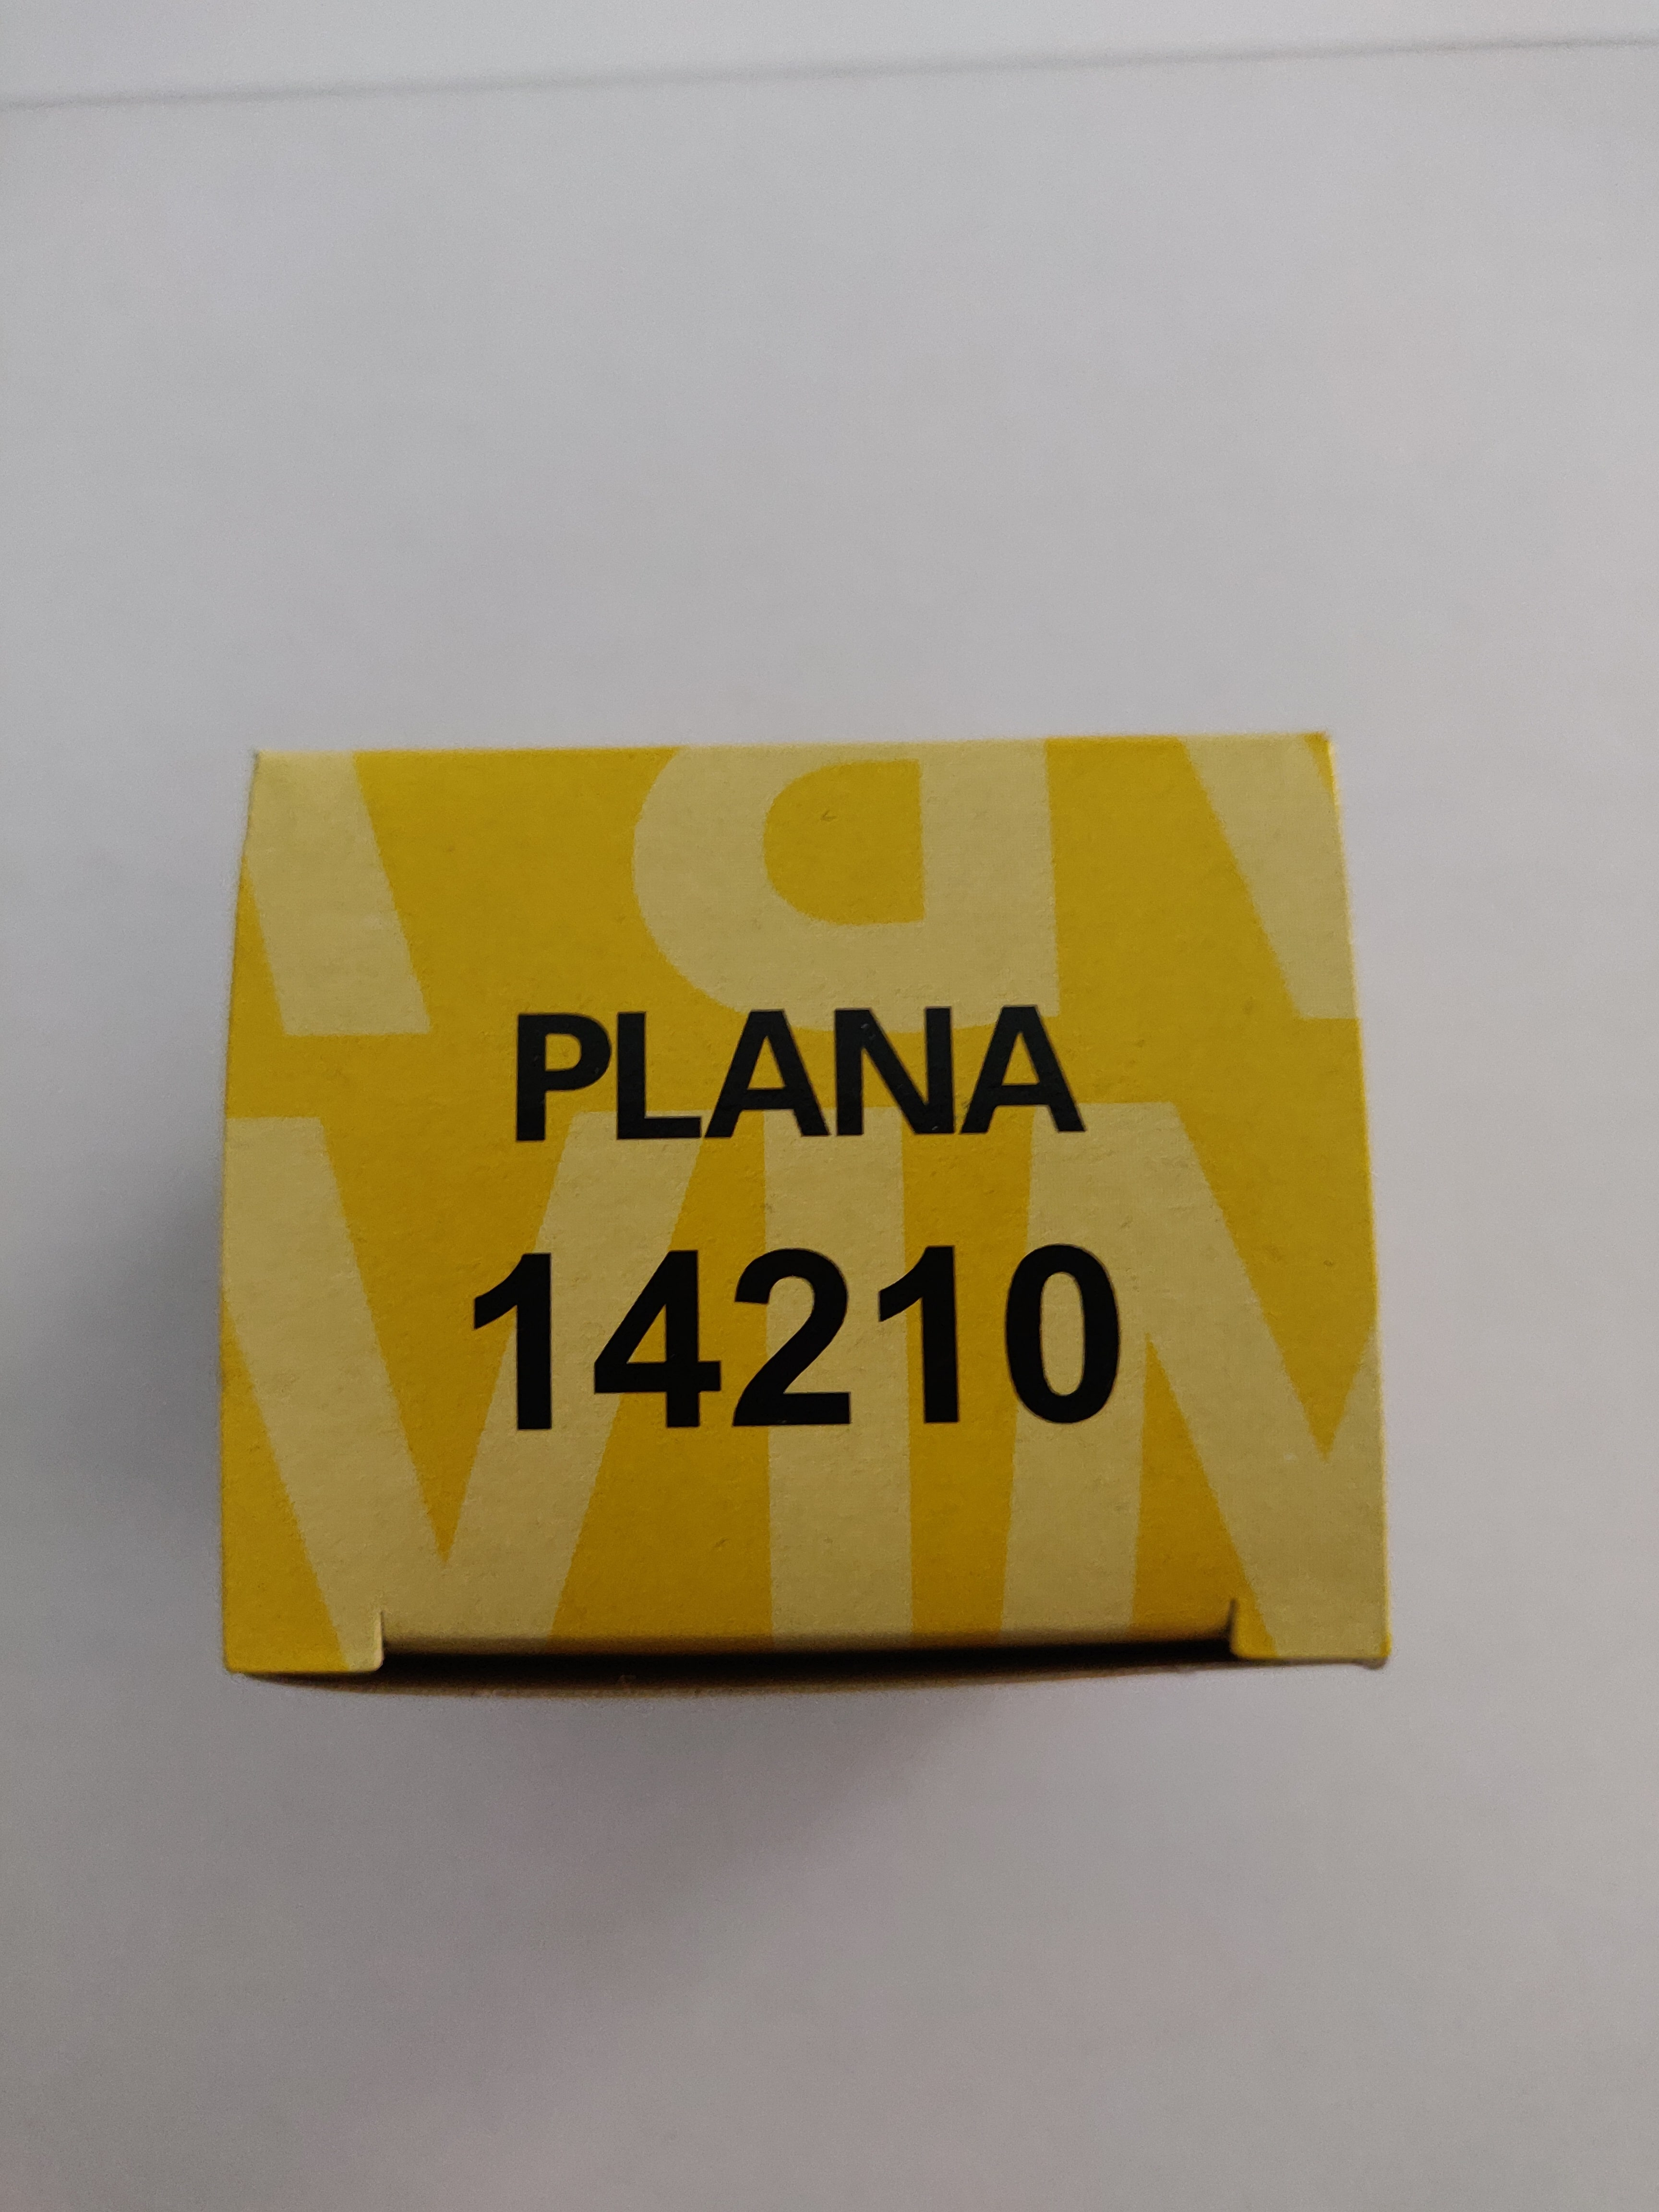 Vimar Plana 14210 - Presa 2P+T 16A Universale Bianco